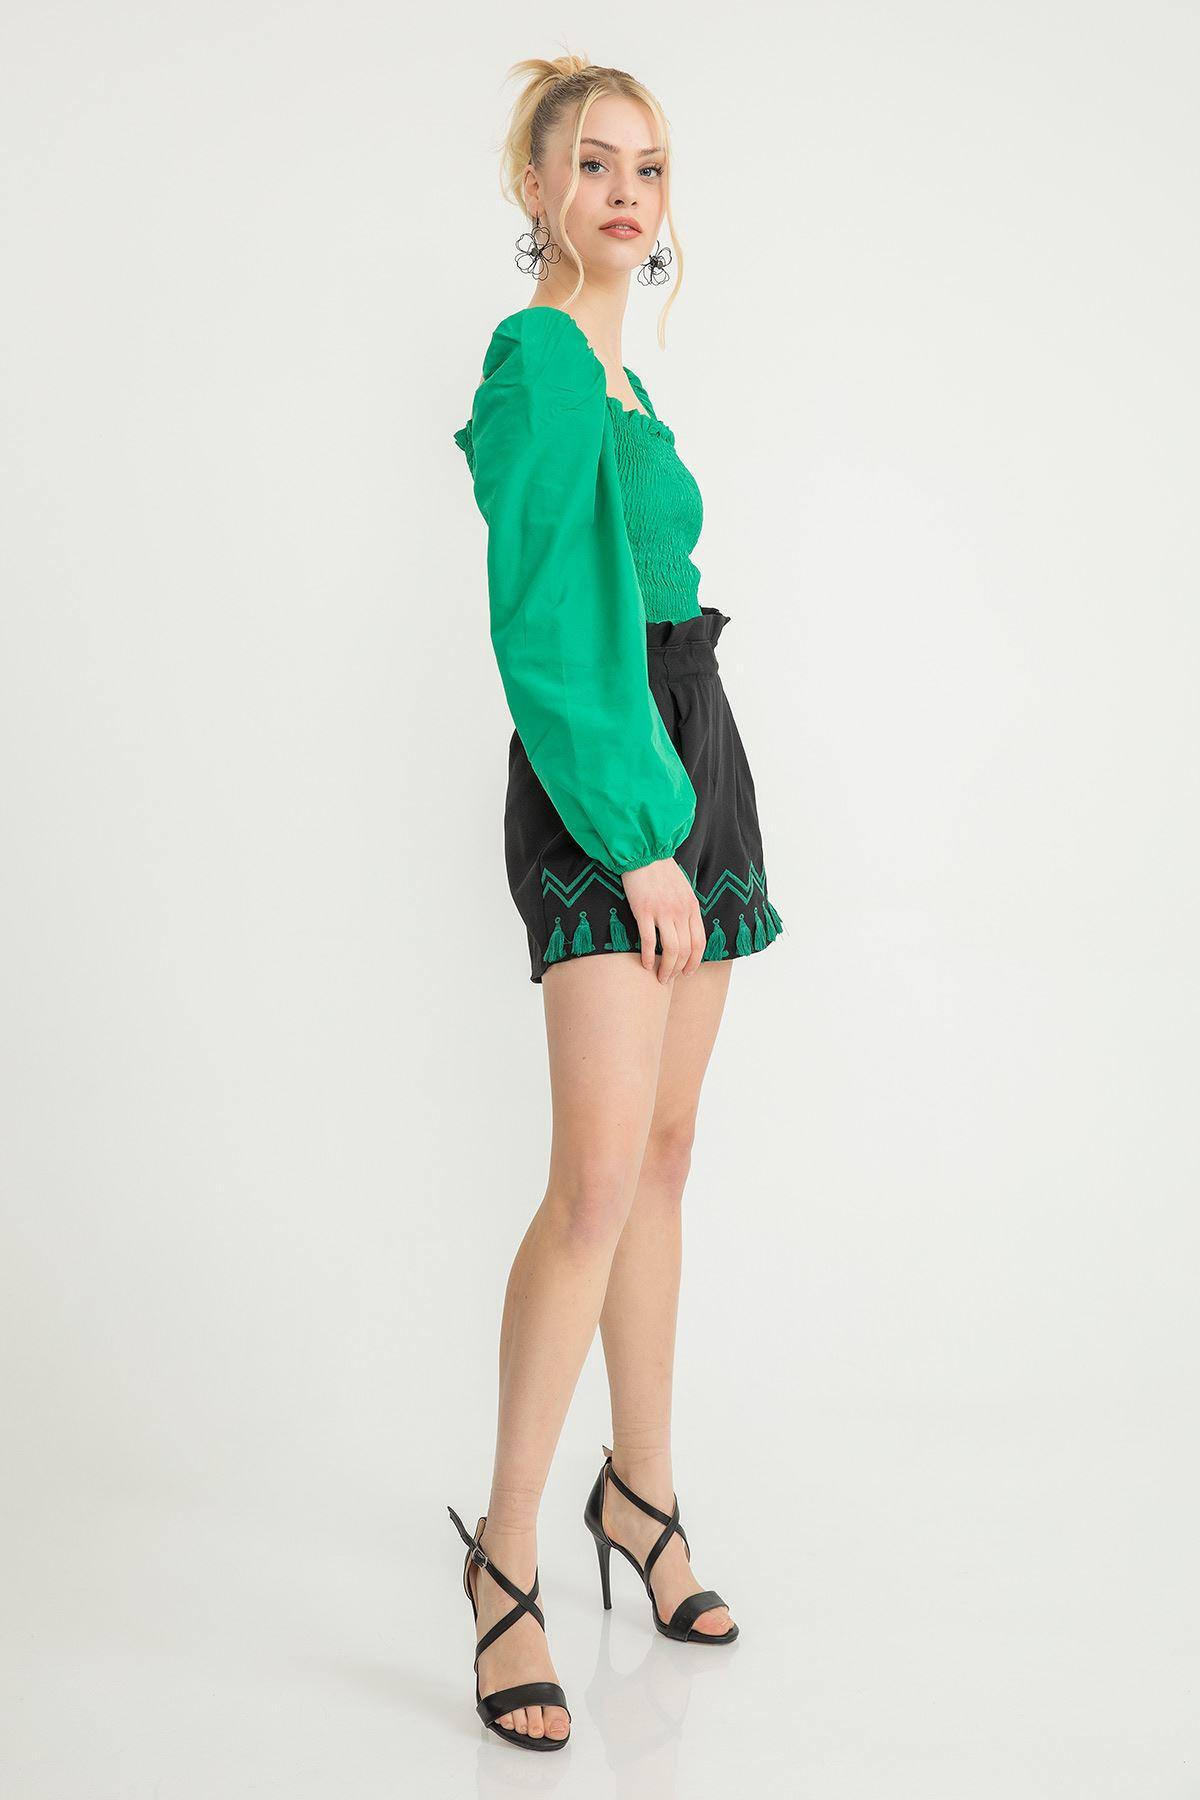 Nakışlı Püskül Detay Şort-Siyah-Yeşil